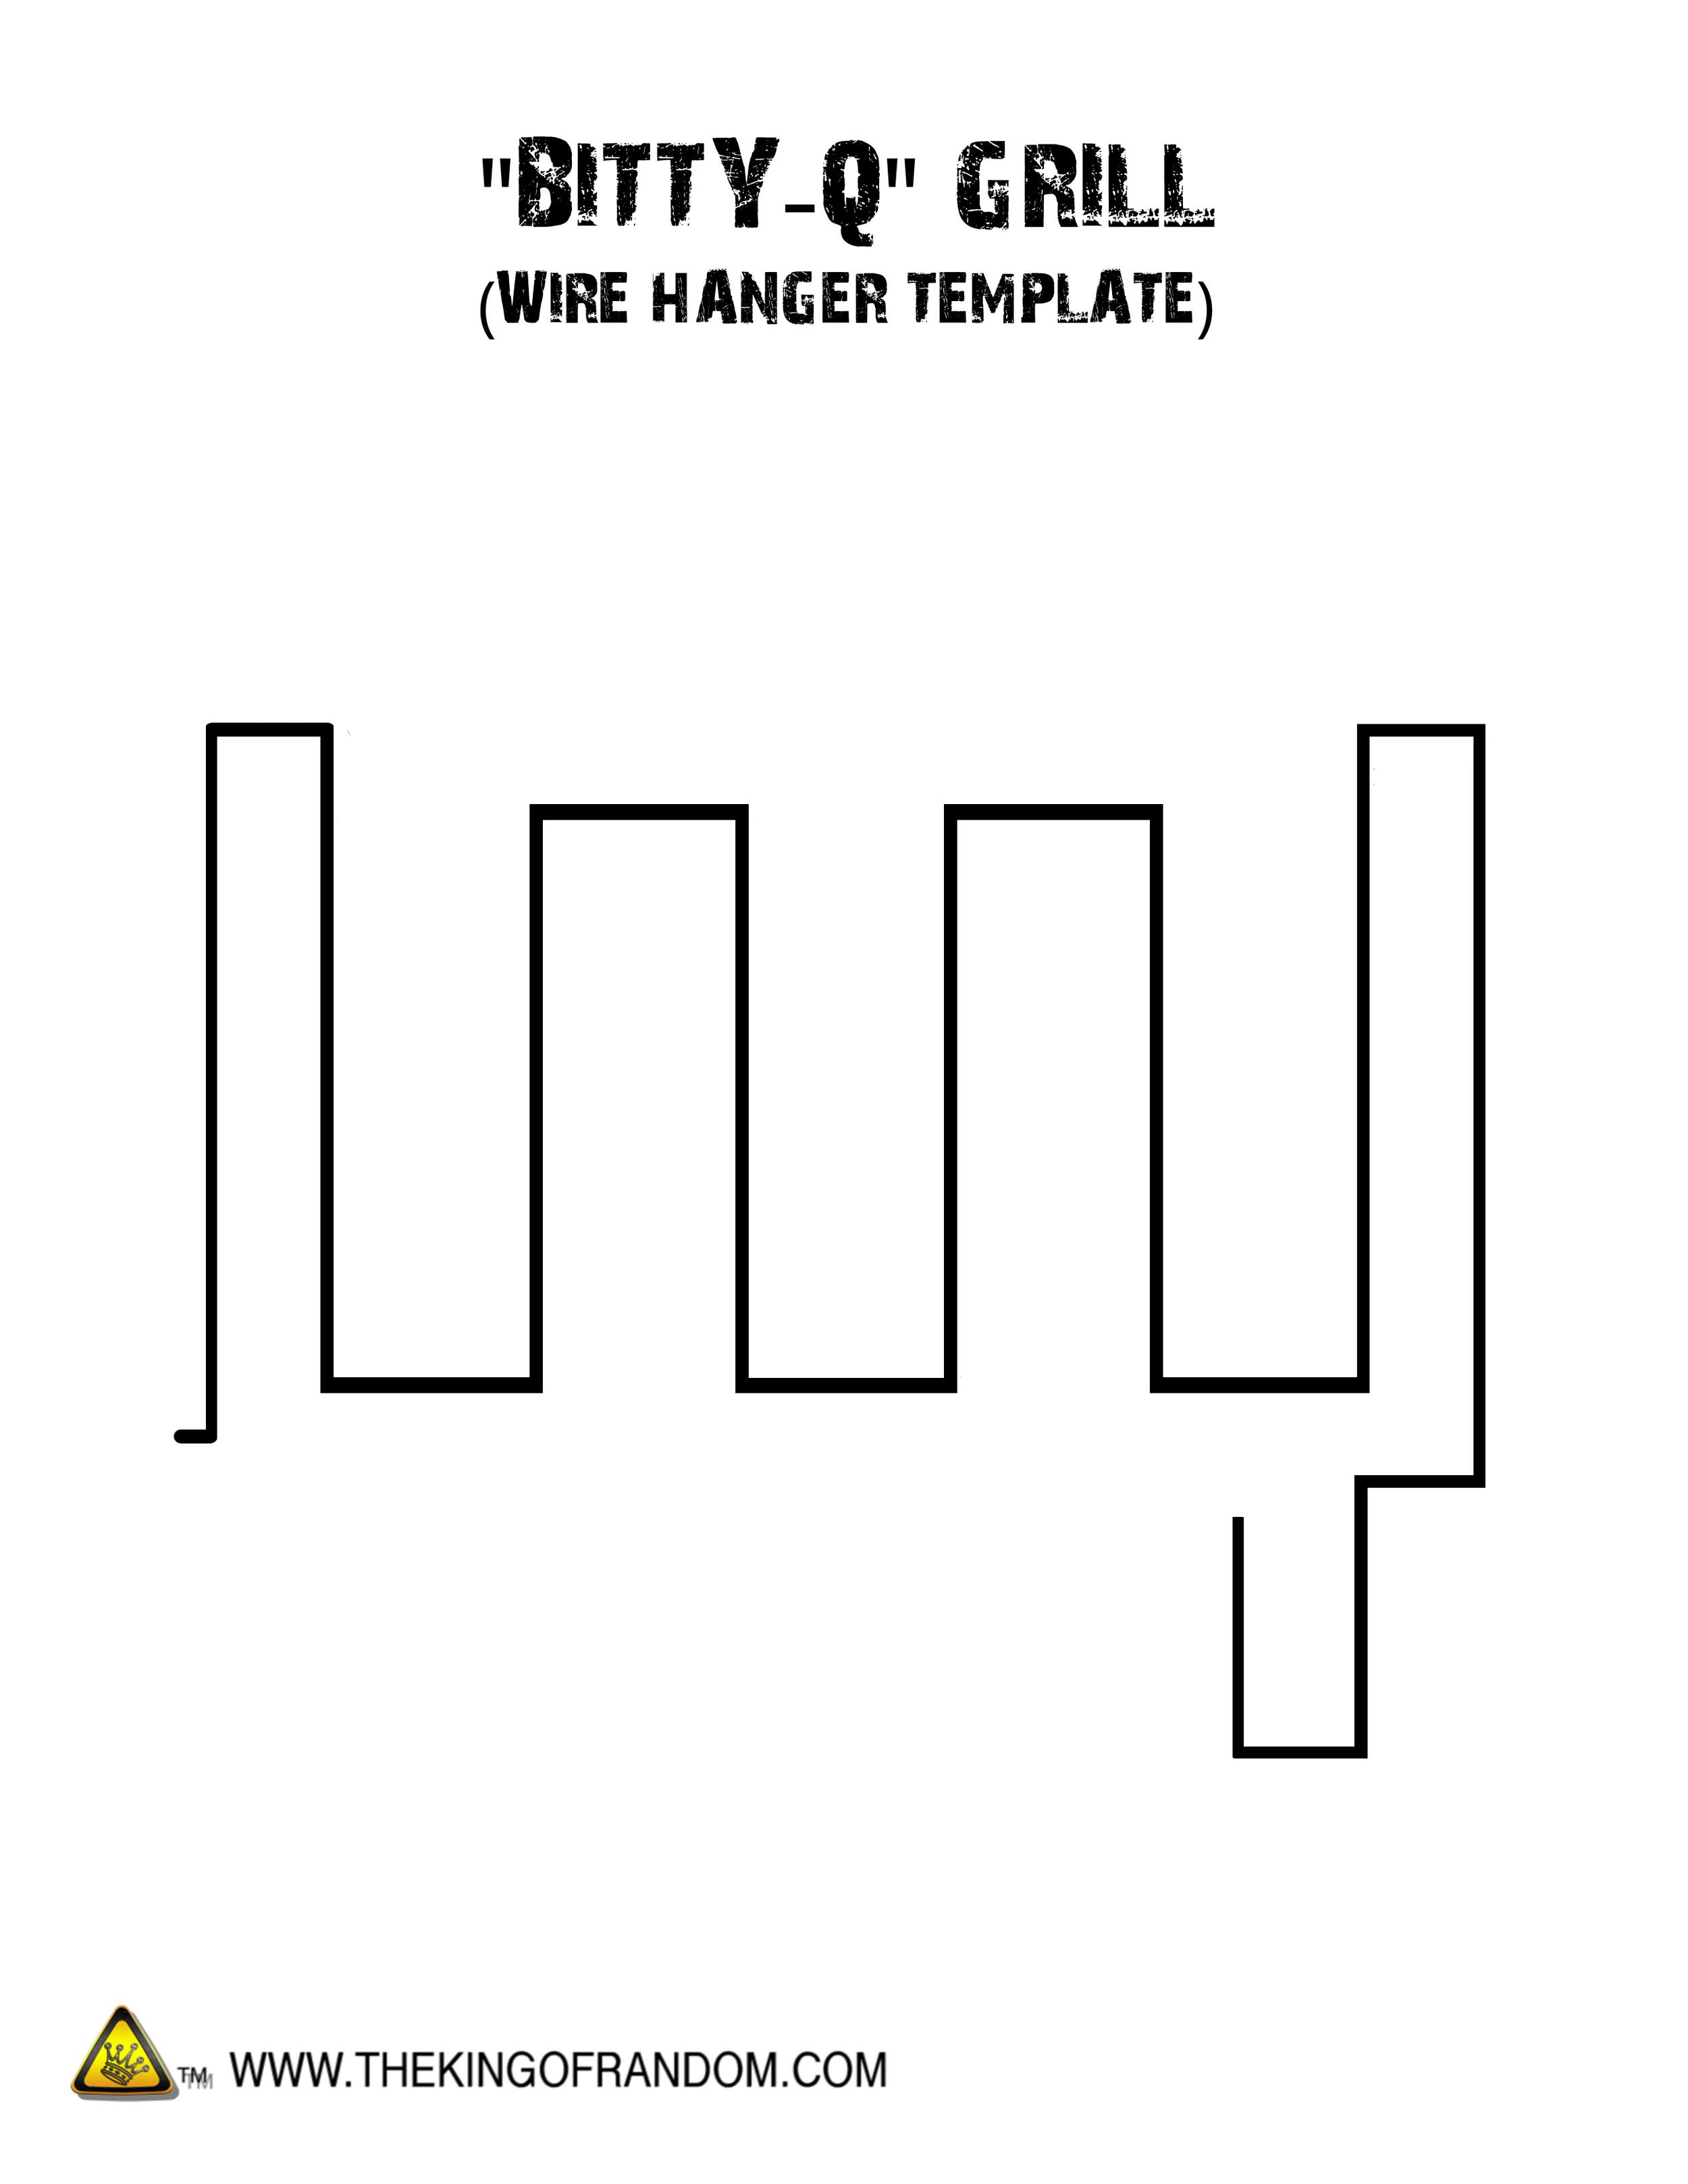 Coat hanger template.jpg